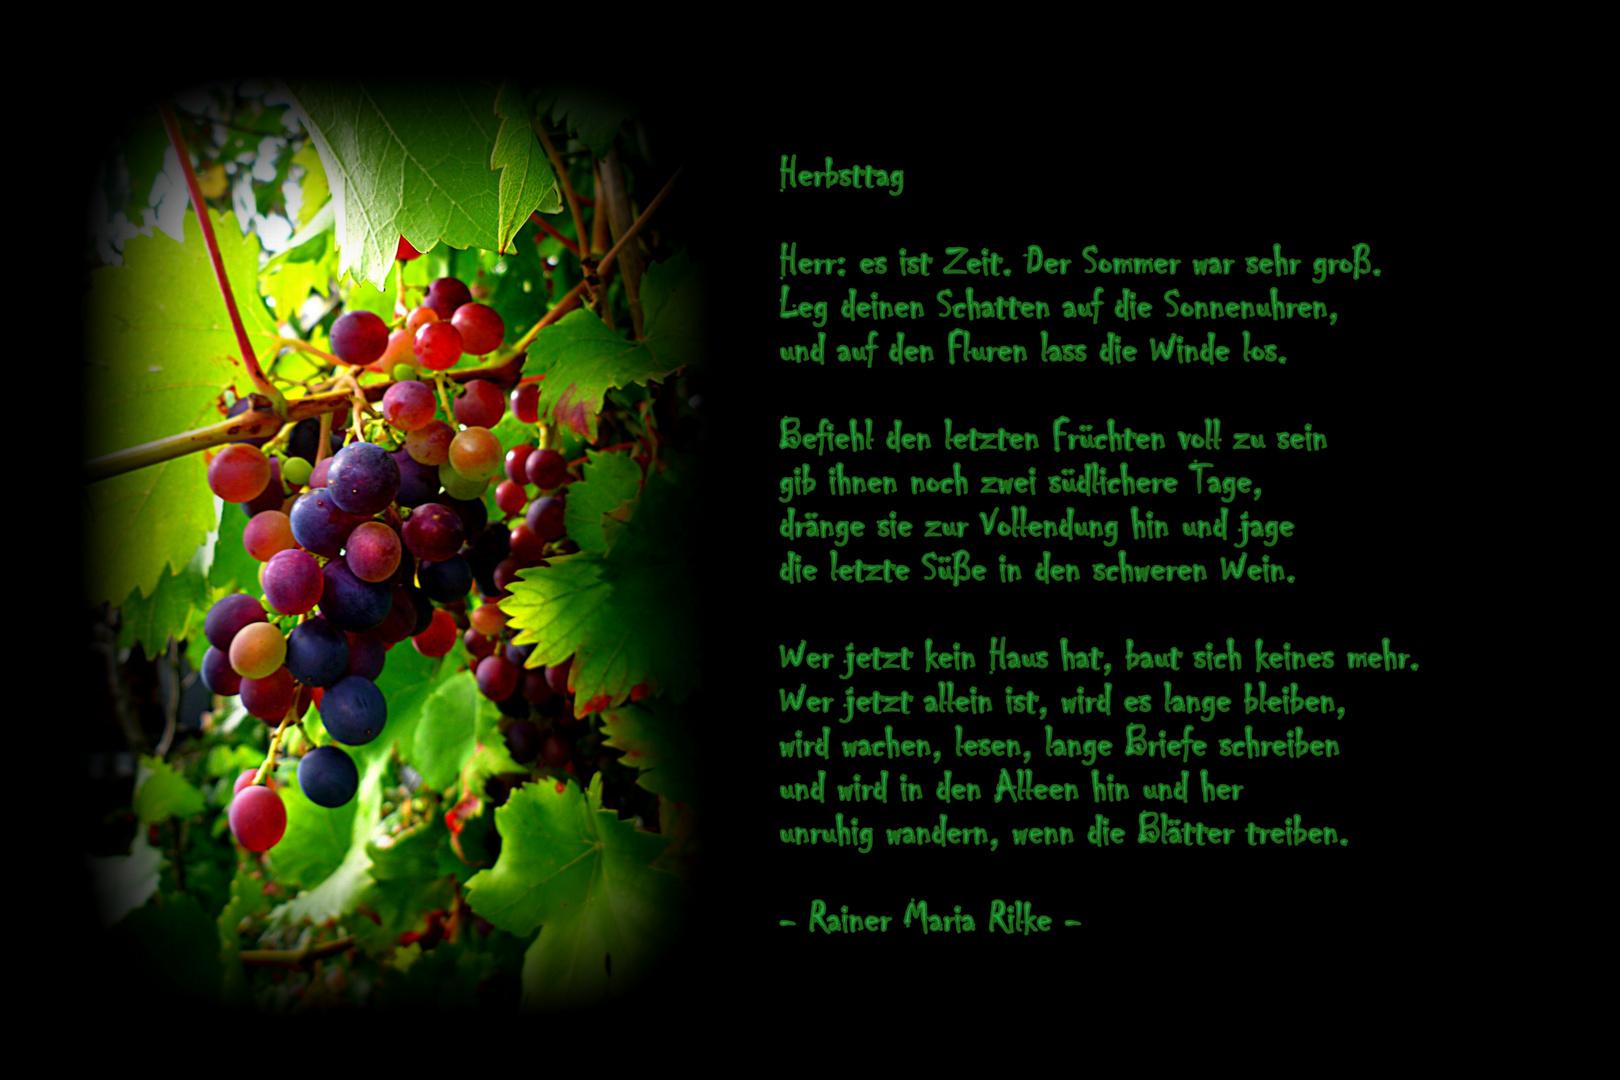 Herbsttag - Rainer Maria Rilke